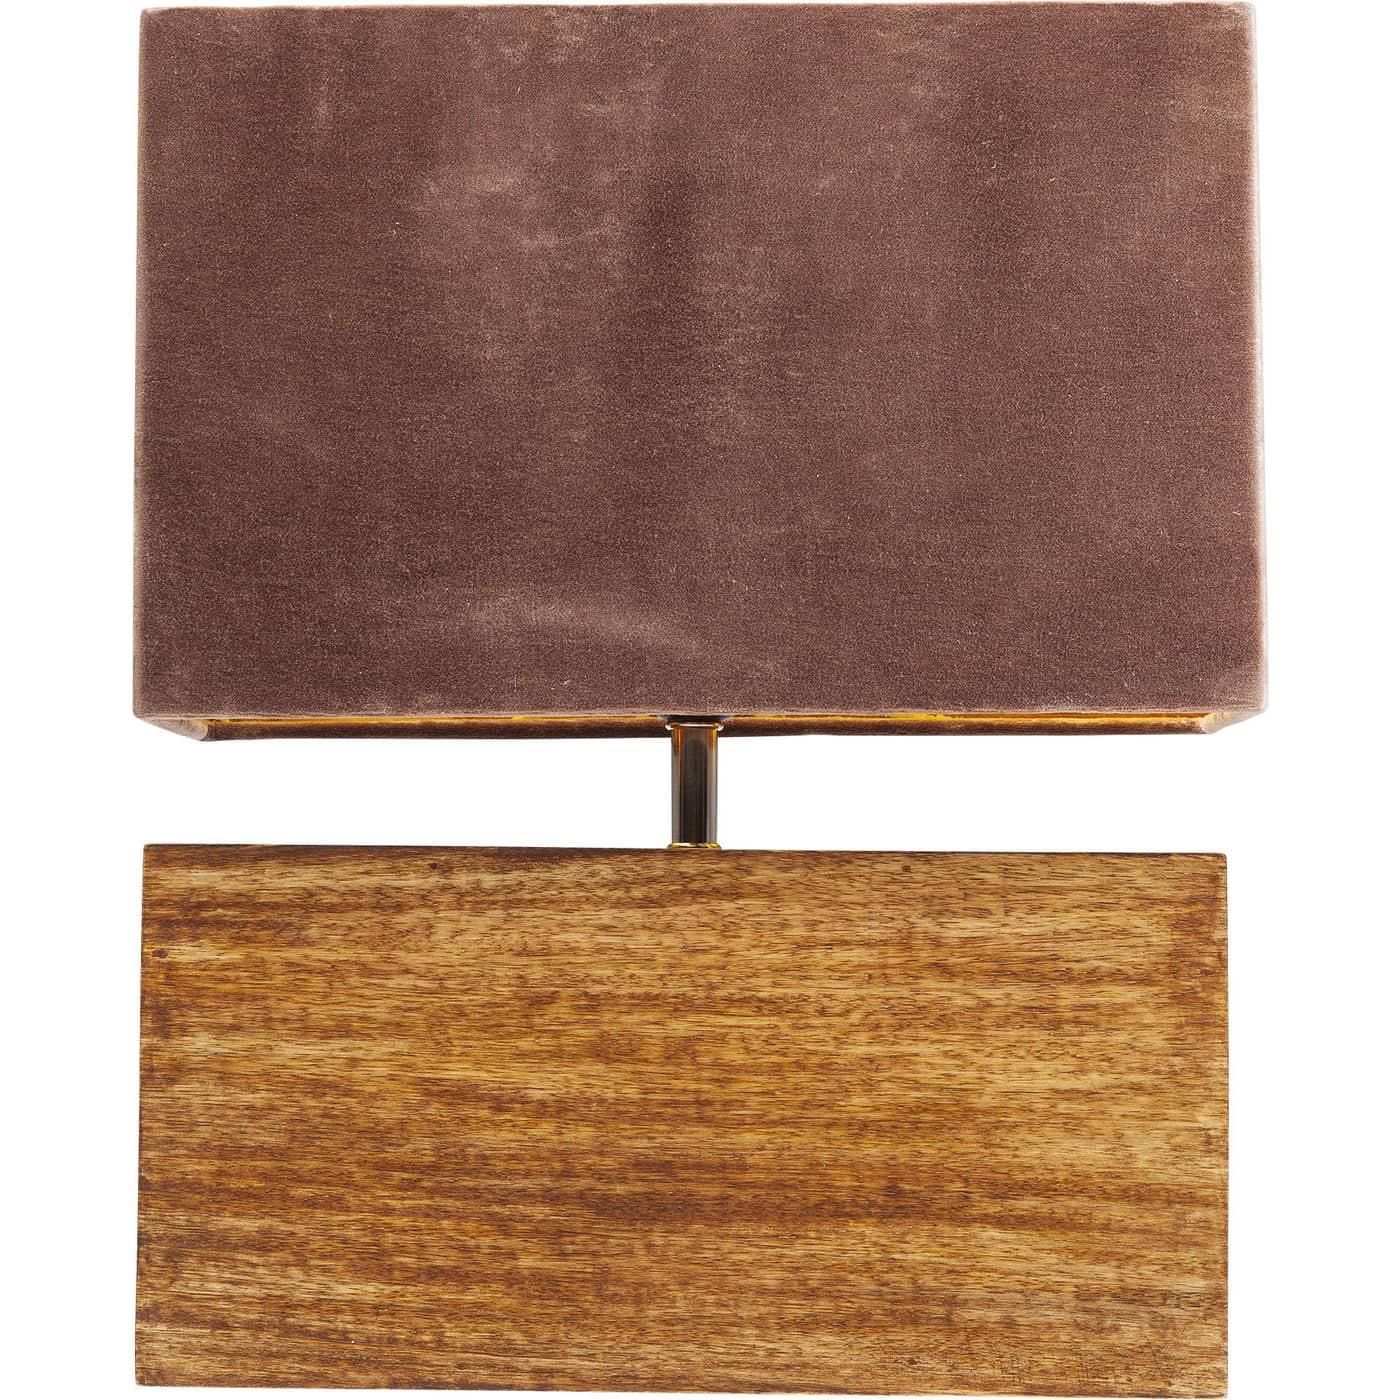 Kare design rectangular wood mocca bordplampe - valnøddebrunt mangotræ/mokka polyester